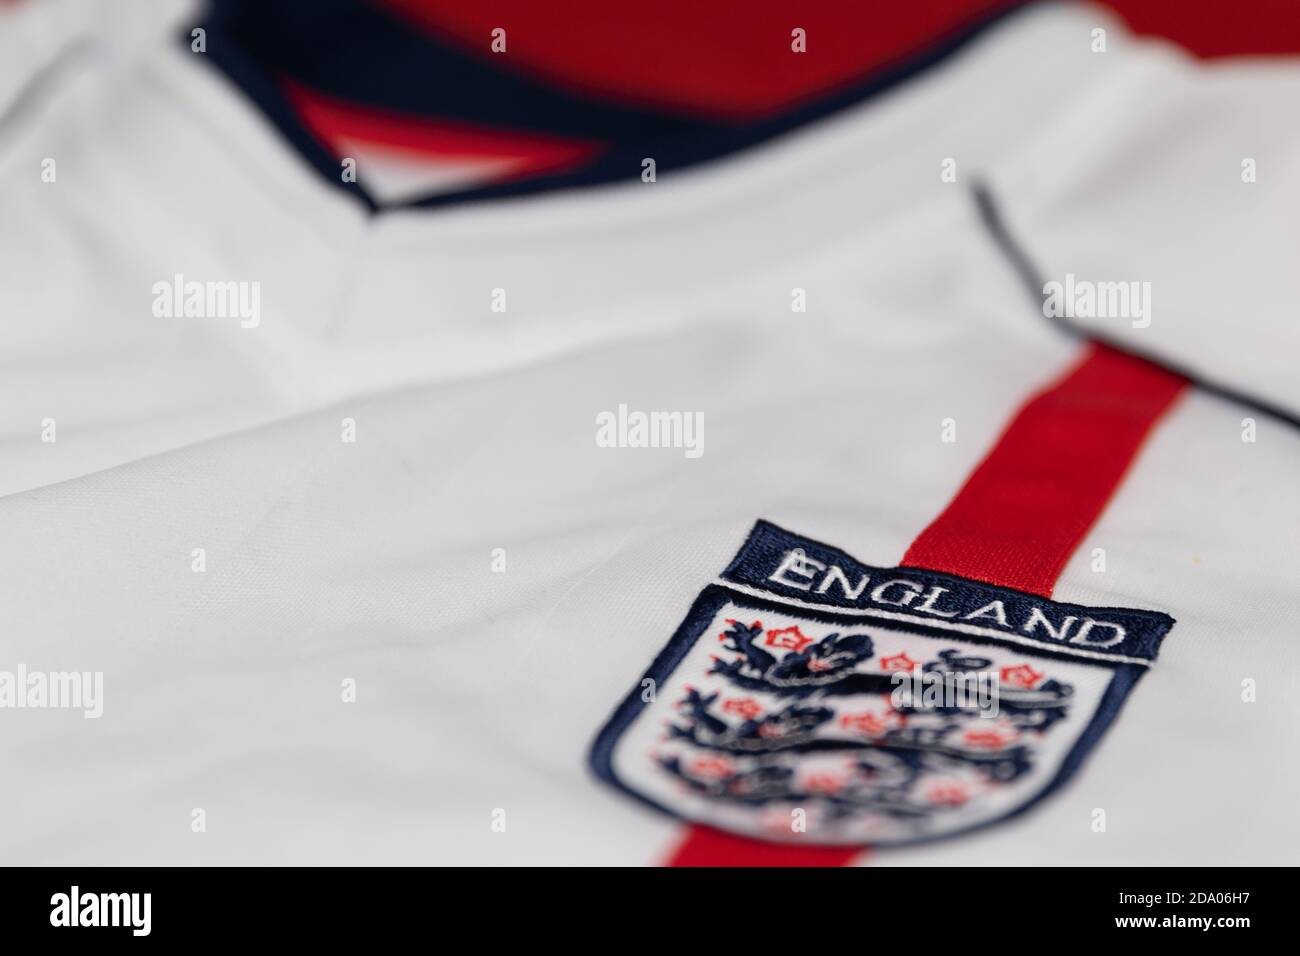 england-three-lions-badge-with-a-red-stripe-on-the-2001-2003-england-home-shirt-2DA06H7.jpg